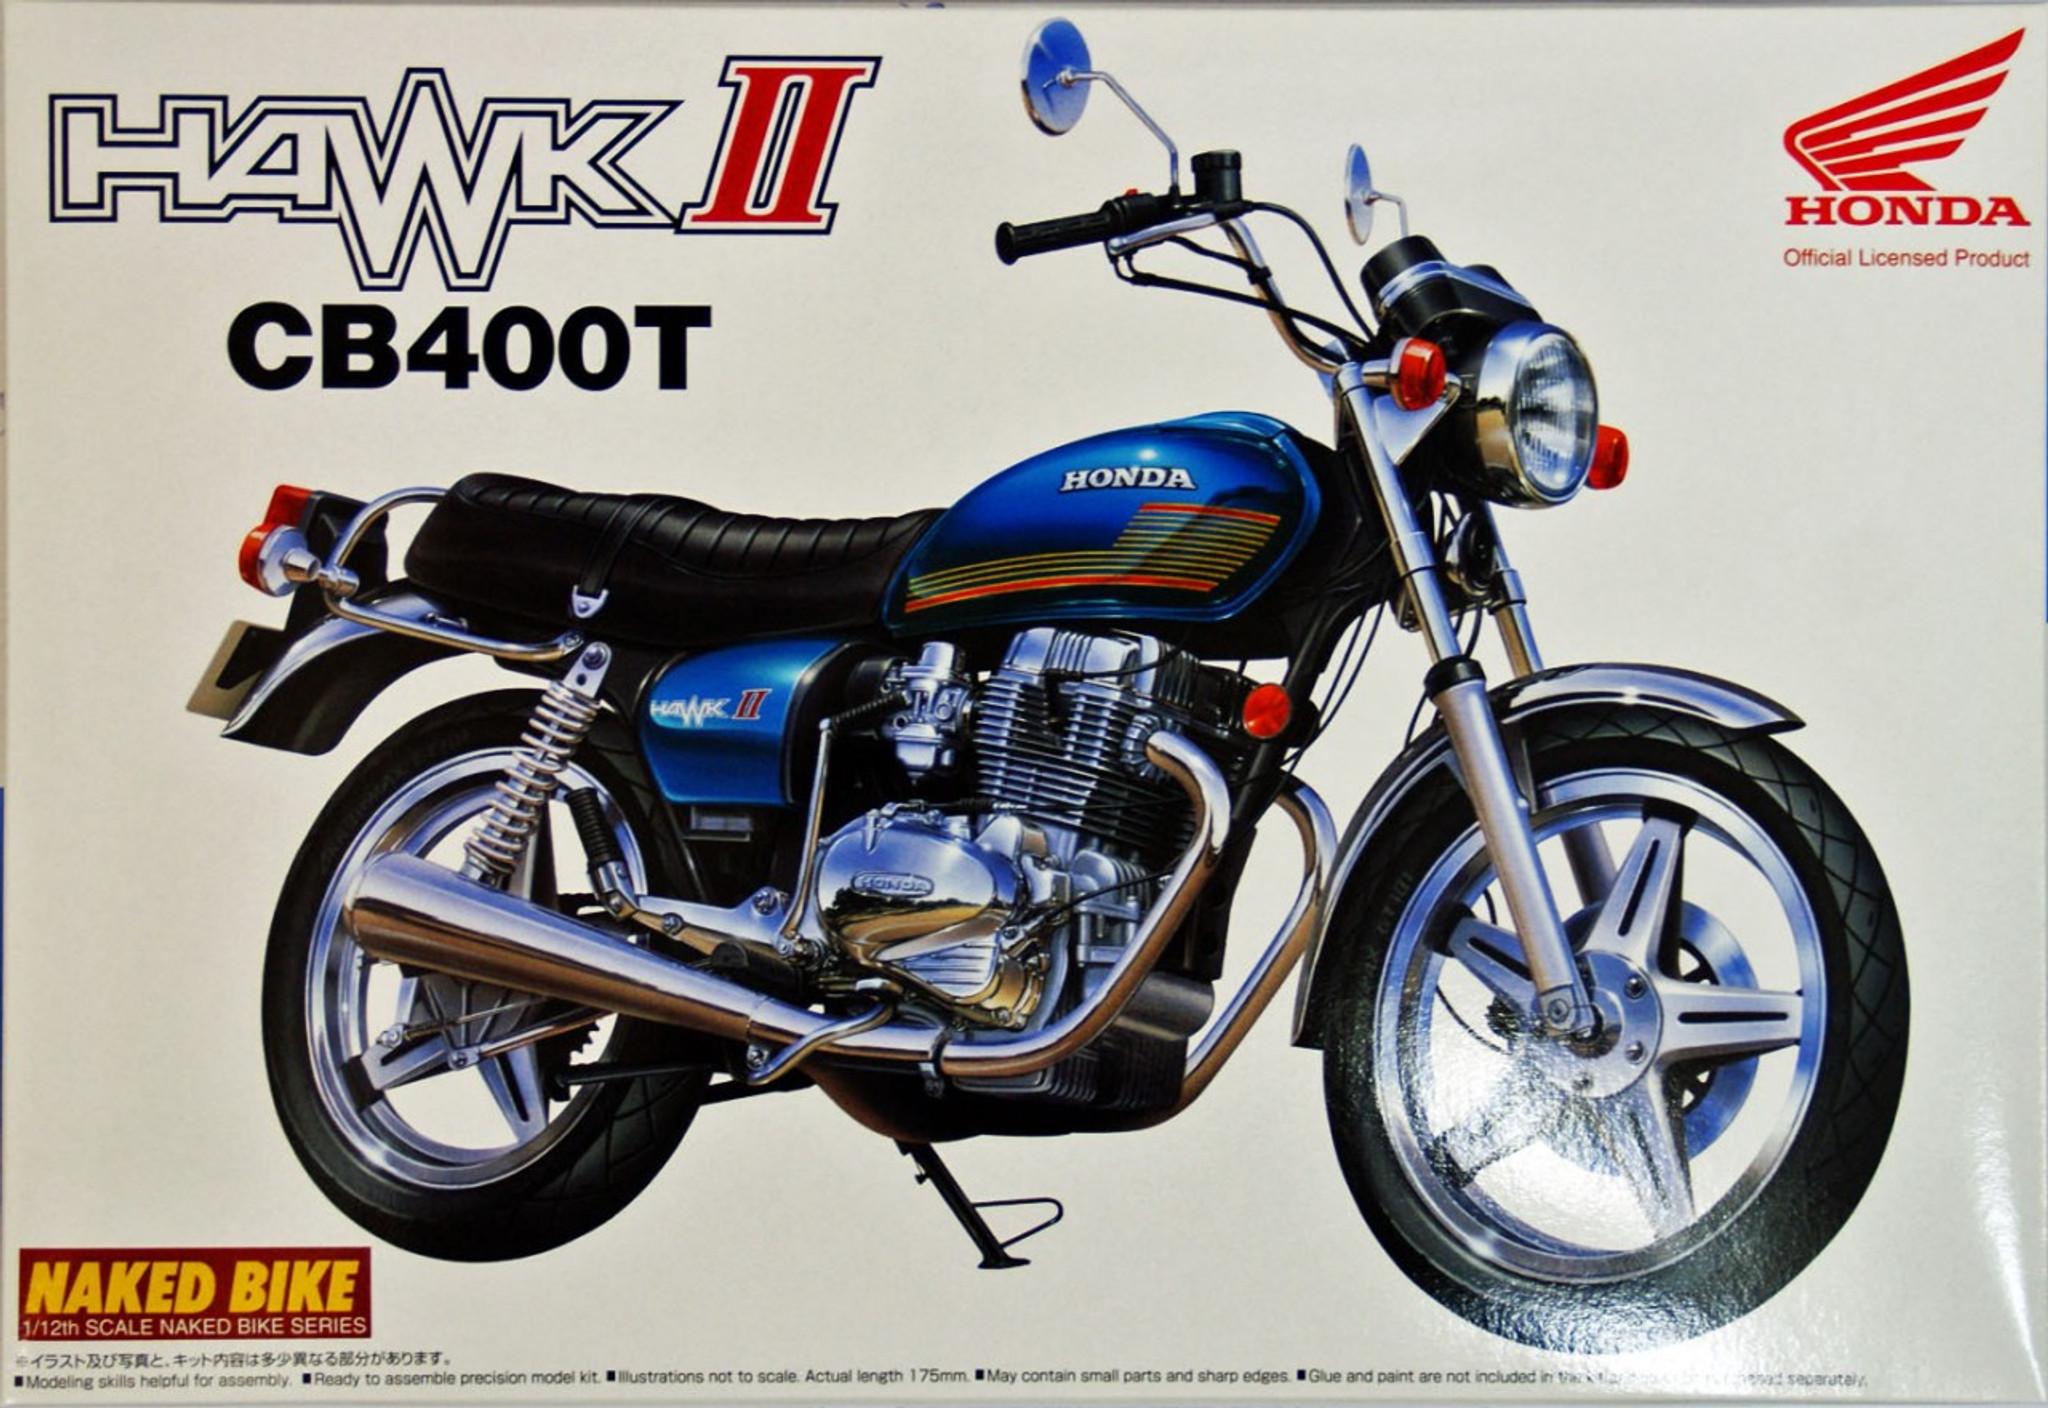 hight resolution of aoshima naked bike 66 47002 honda hawk ii cb400t 1 12 scale kit plaza japan